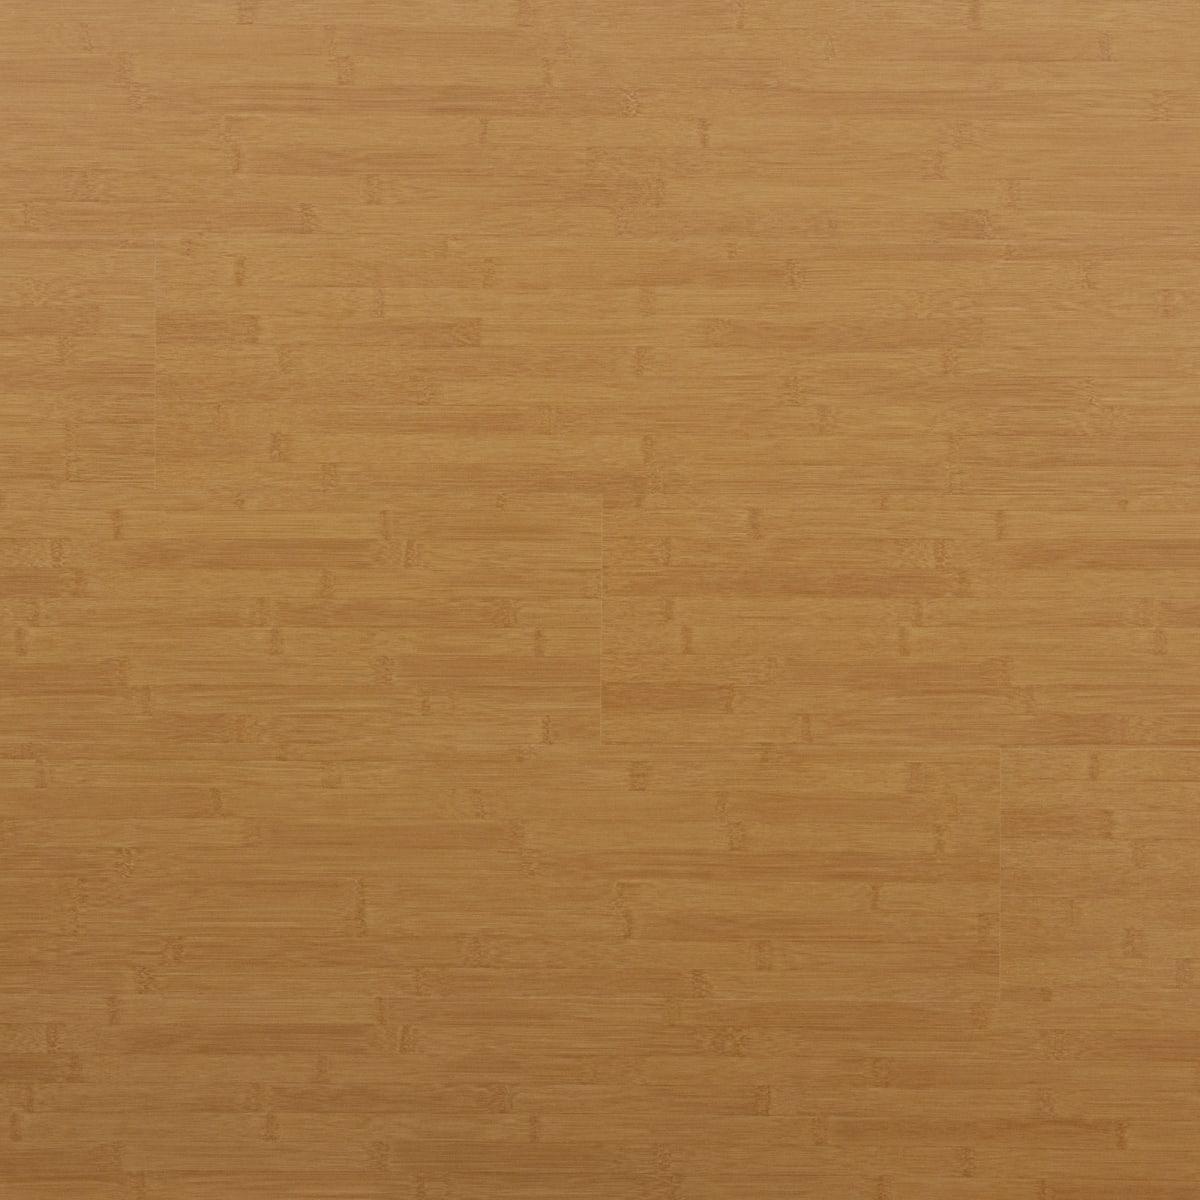 Ламинат «Бамбук светлый» KR 32 класс толщина 8 мм 2.131 м2